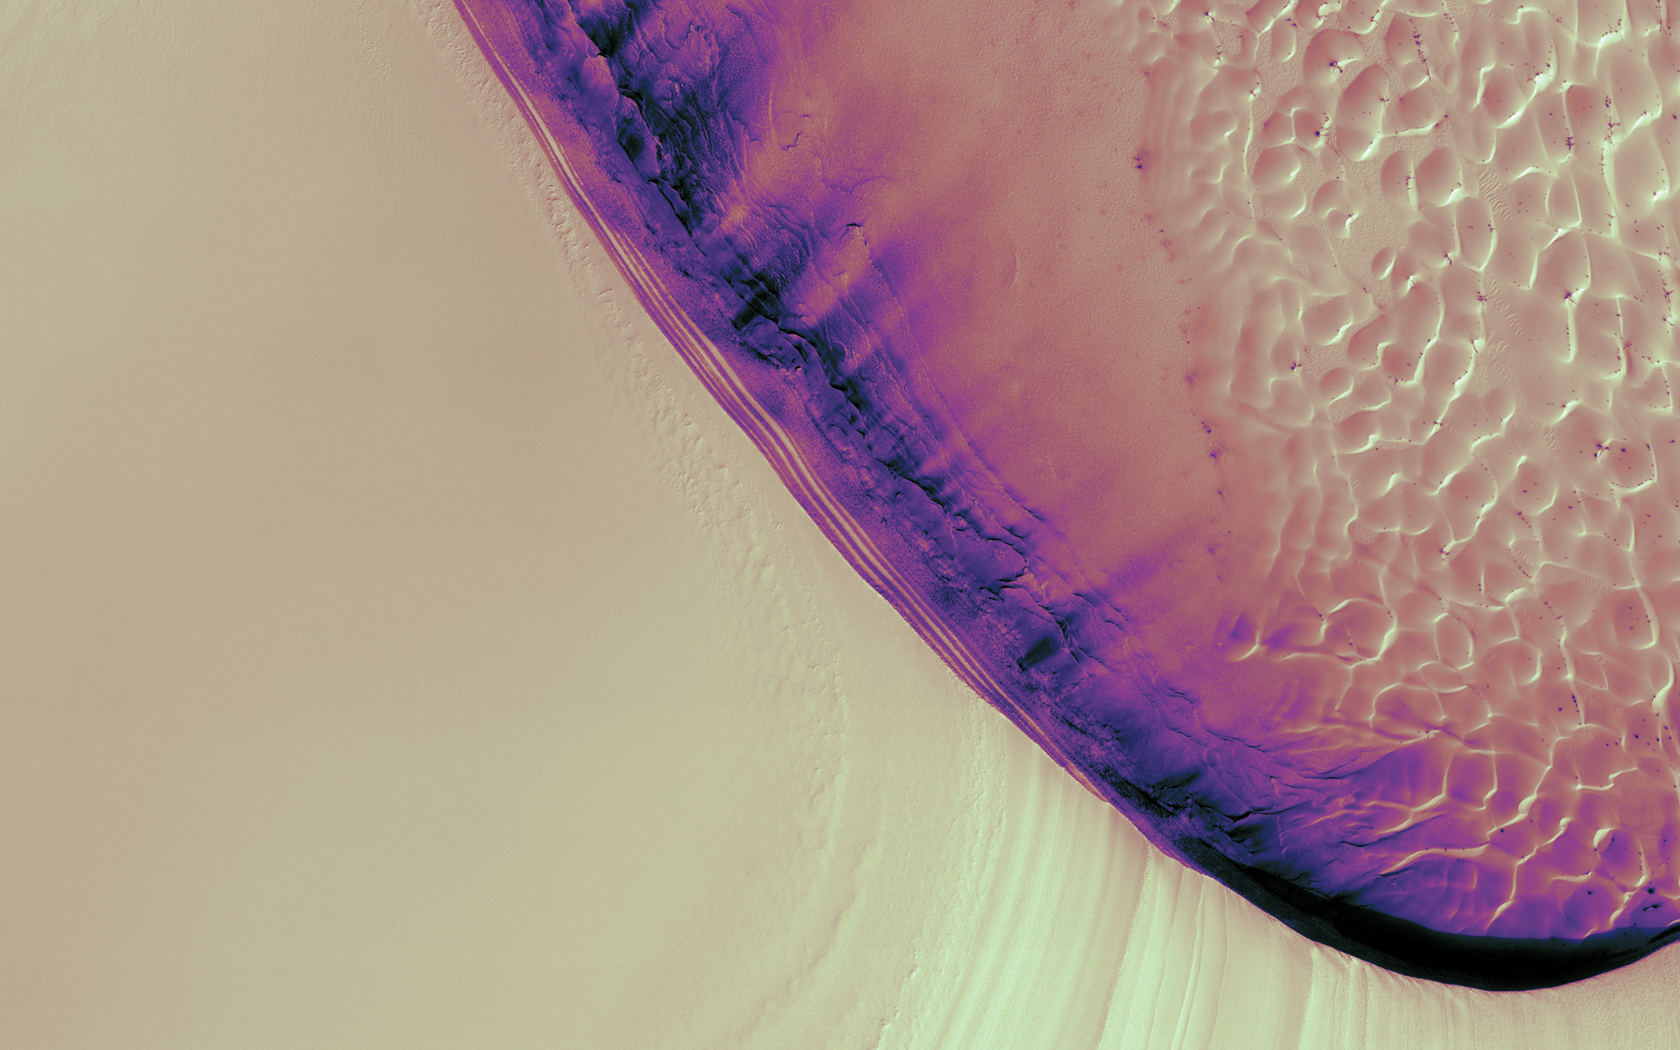 Full HD Wallpapers Dual Screen Space Dunes Left Screen Mars 1680x1050